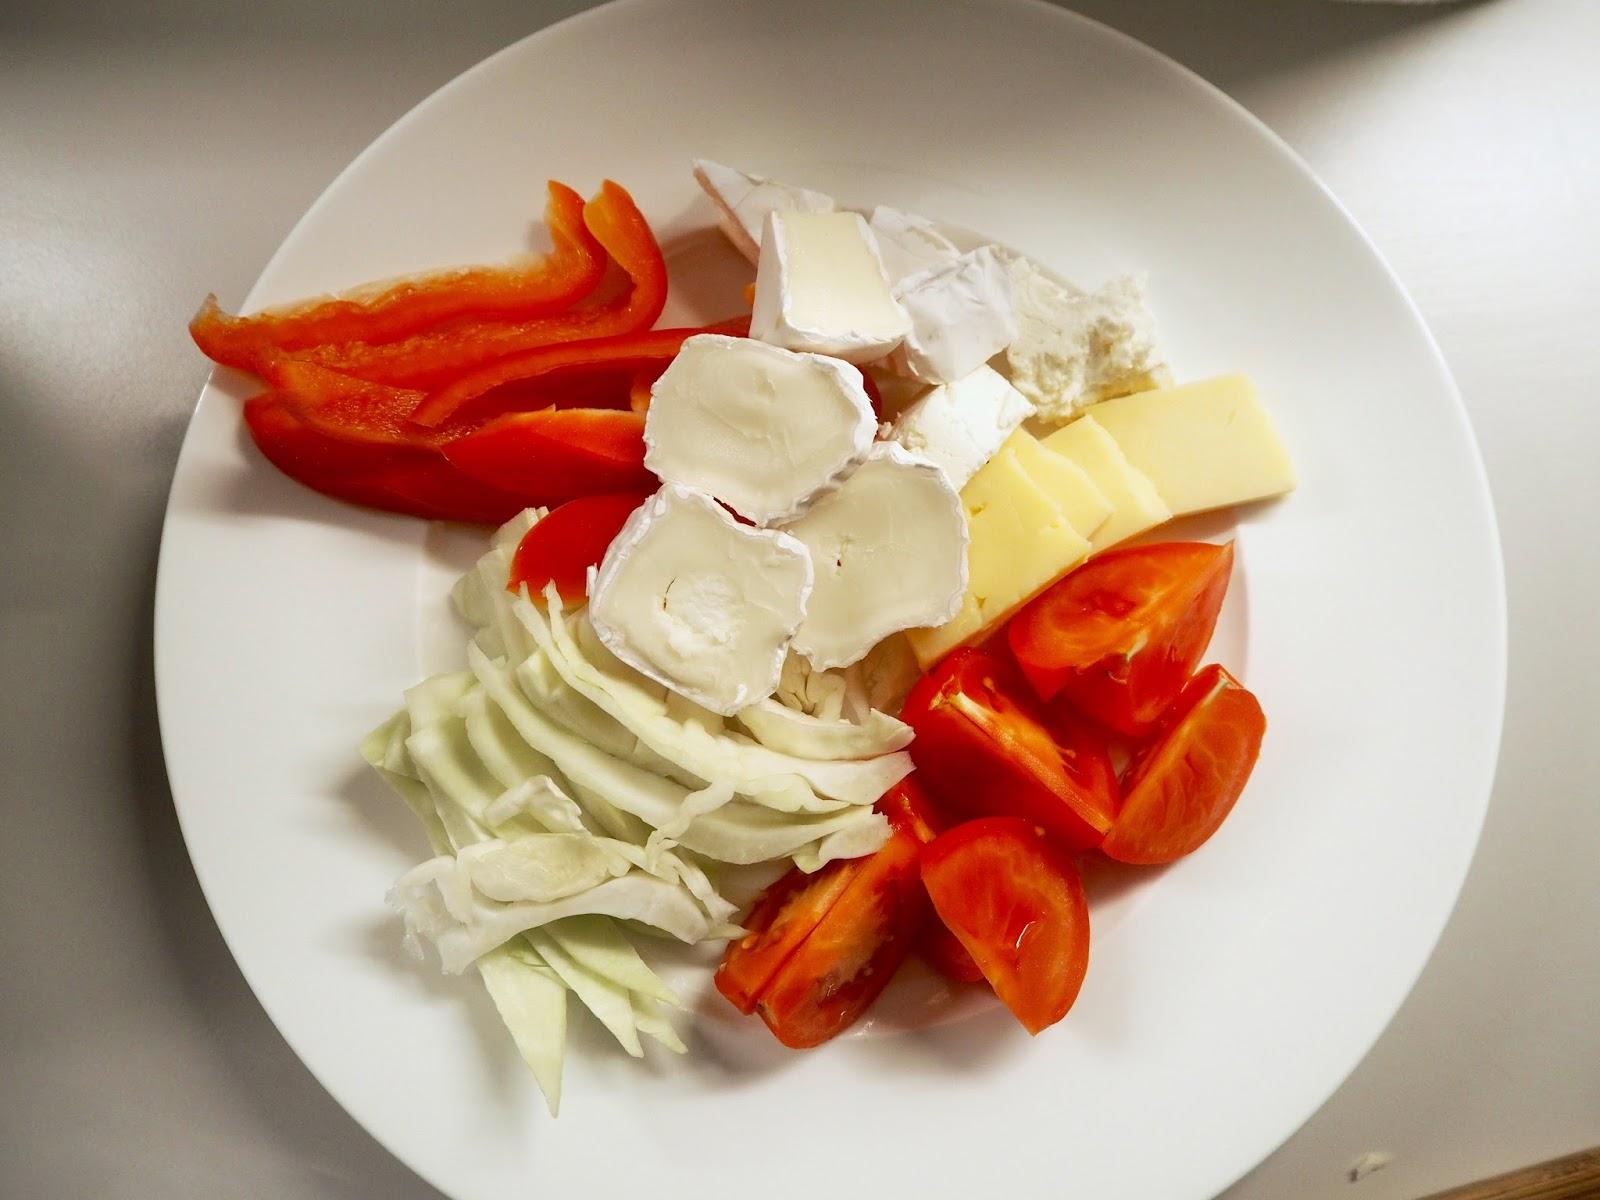 FOOD DIARY 11